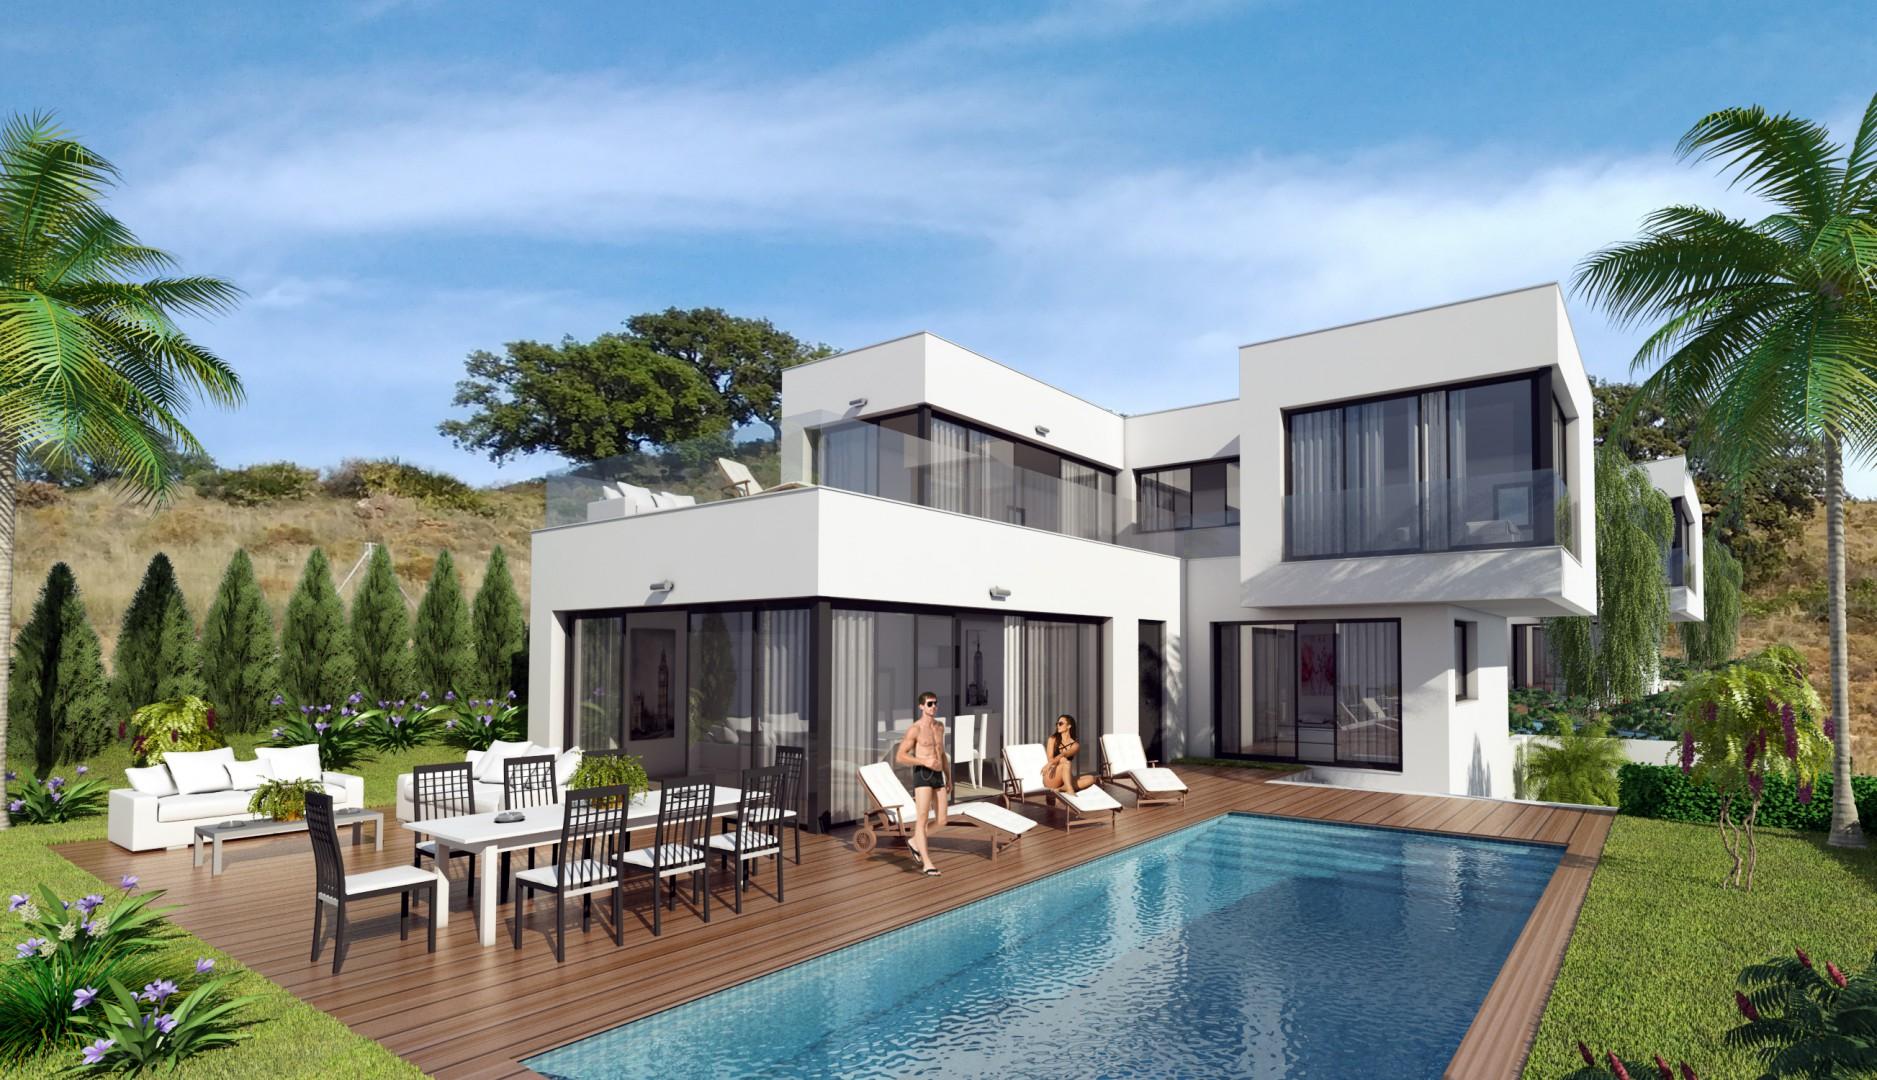 moderne luxe villa 39 s te koop costa del sol spanje specials. Black Bedroom Furniture Sets. Home Design Ideas